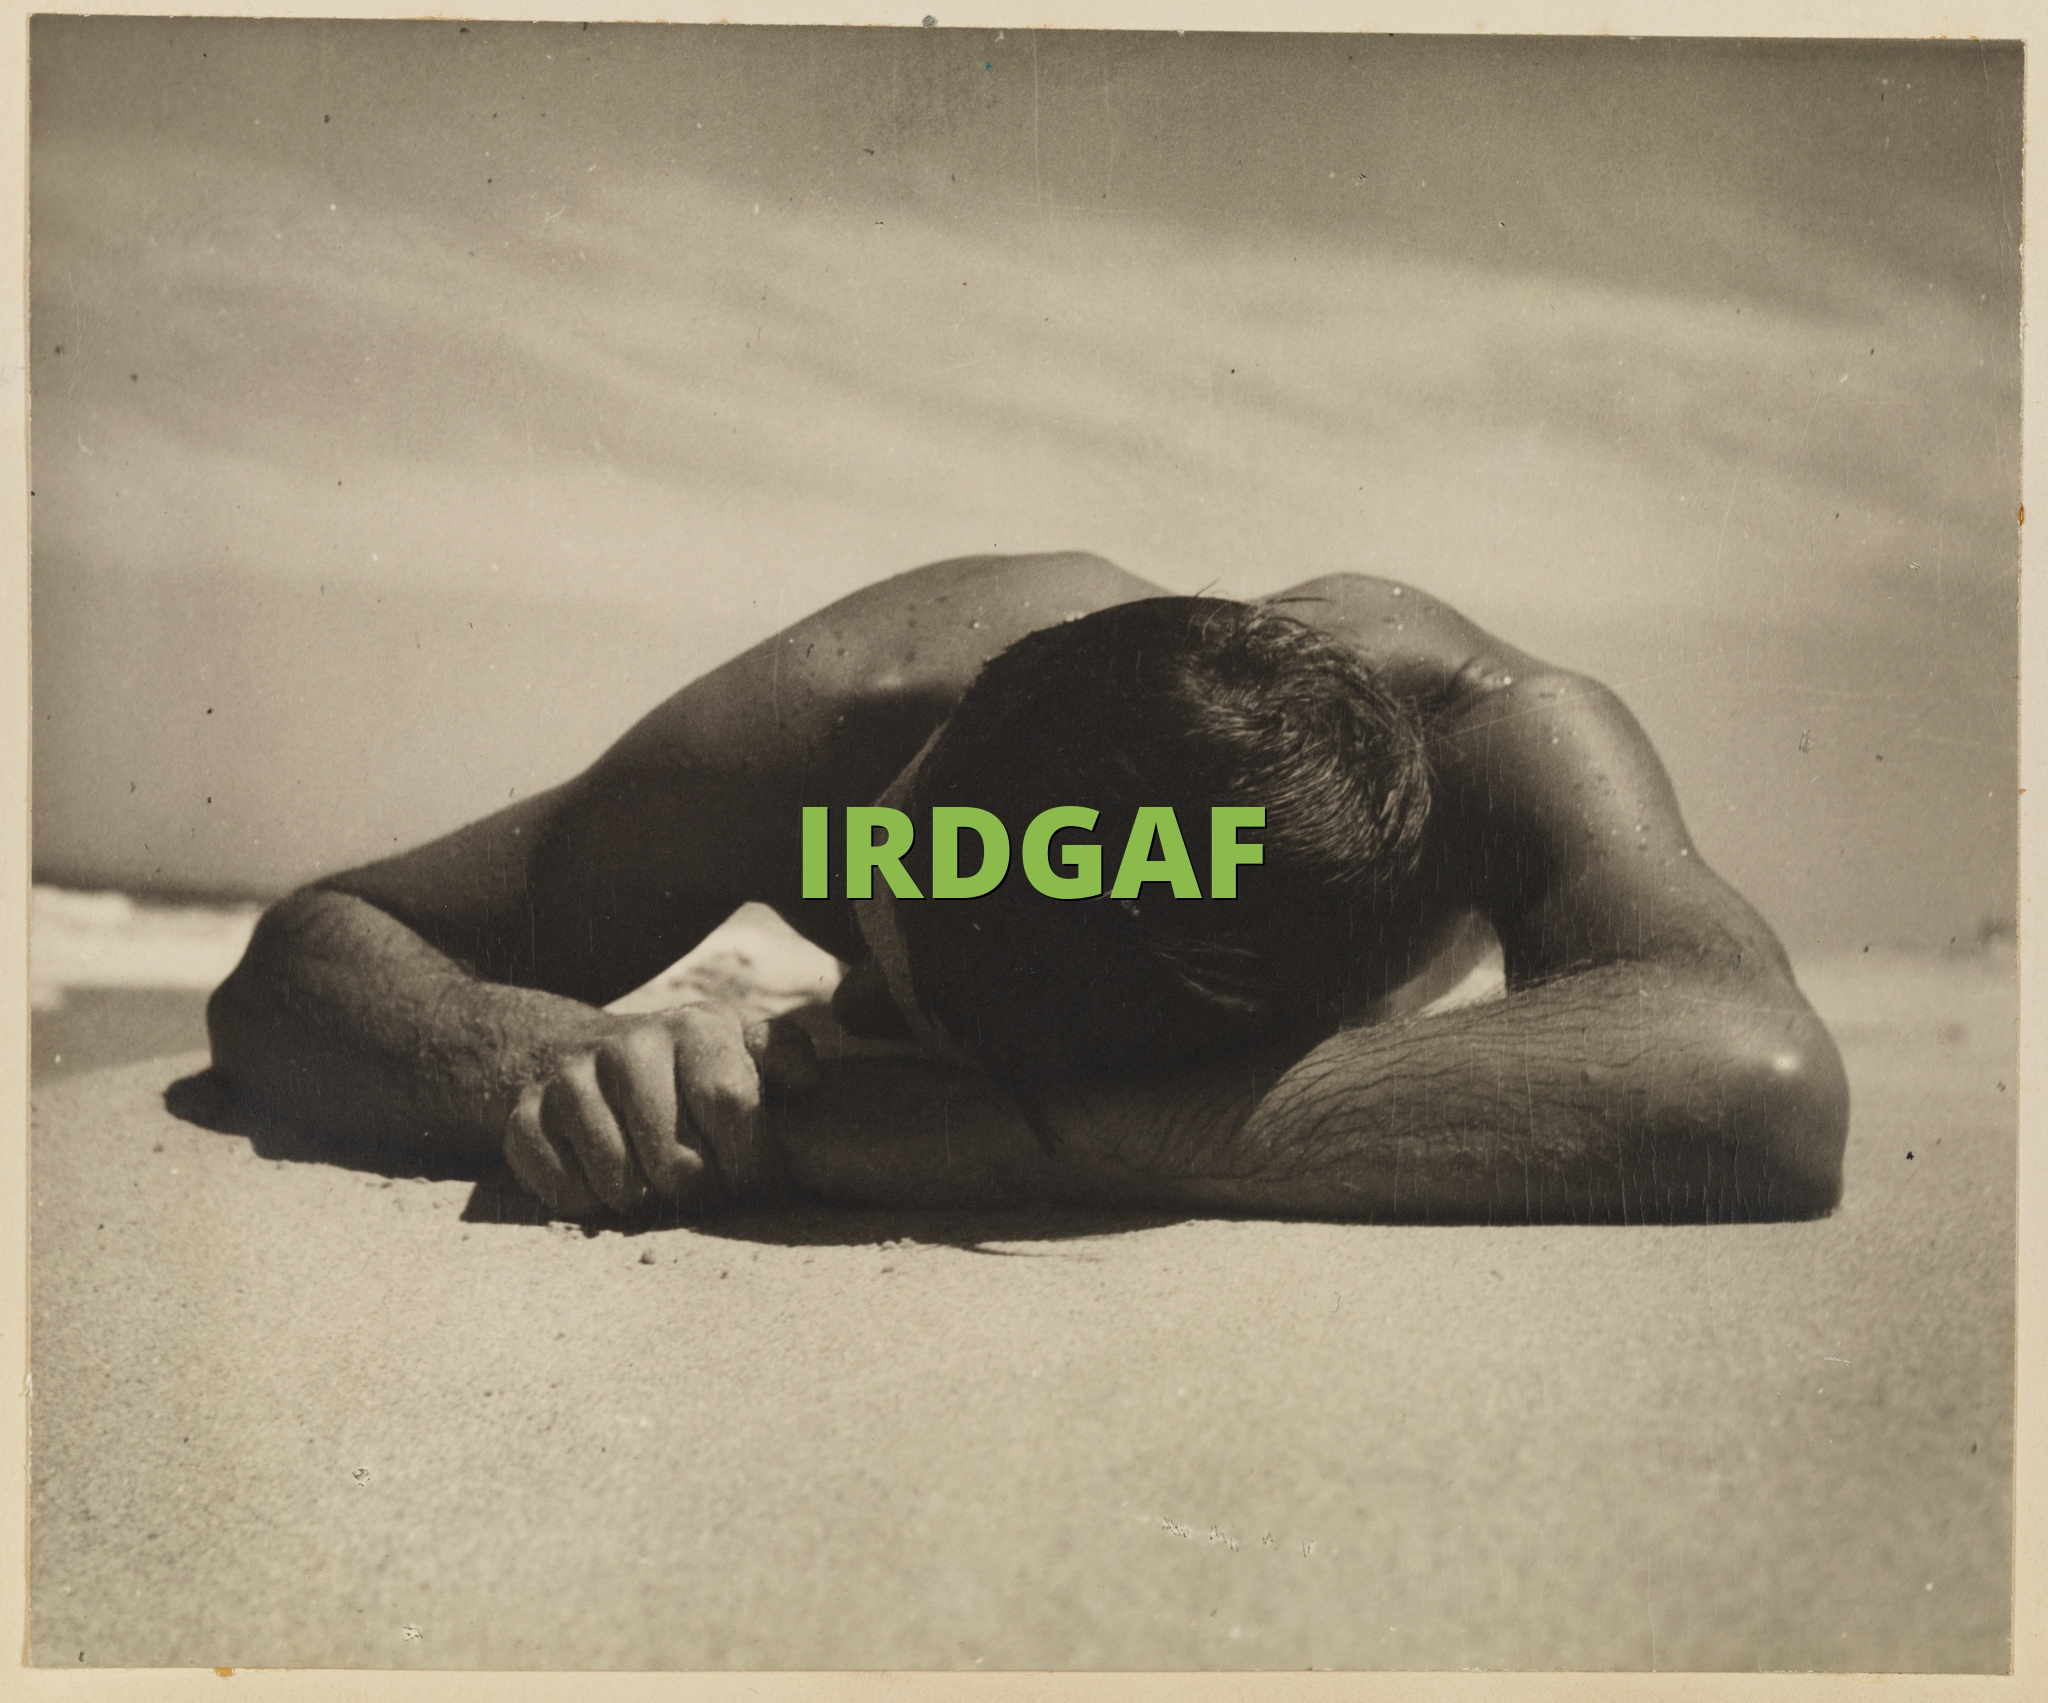 IRDGAF